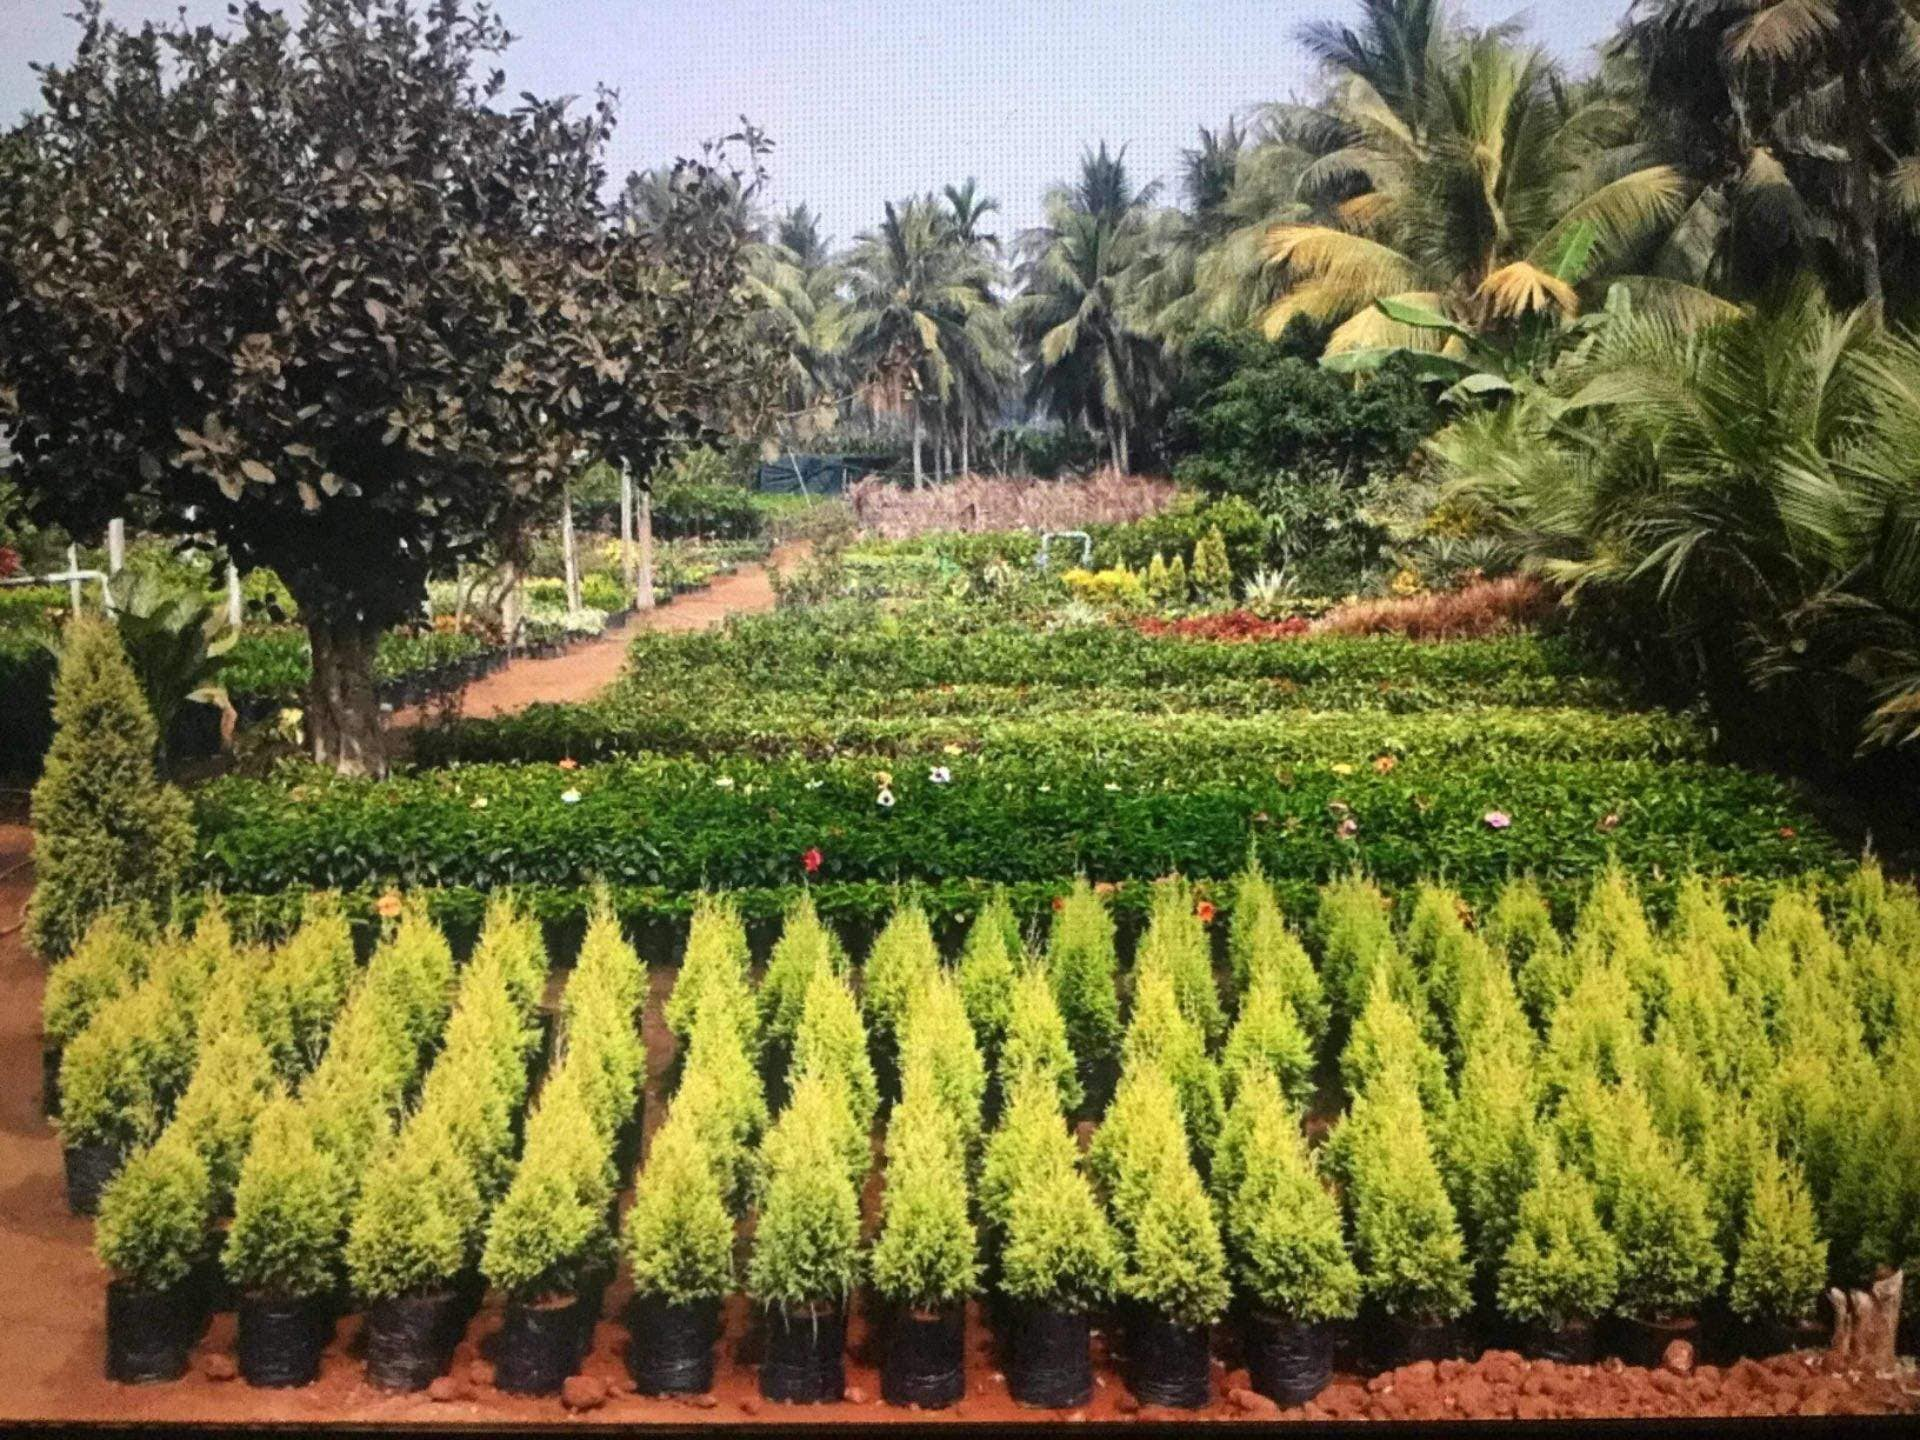 Top 20 Plant Nurseries in Khammam - Best Nursery Plant Suppliers